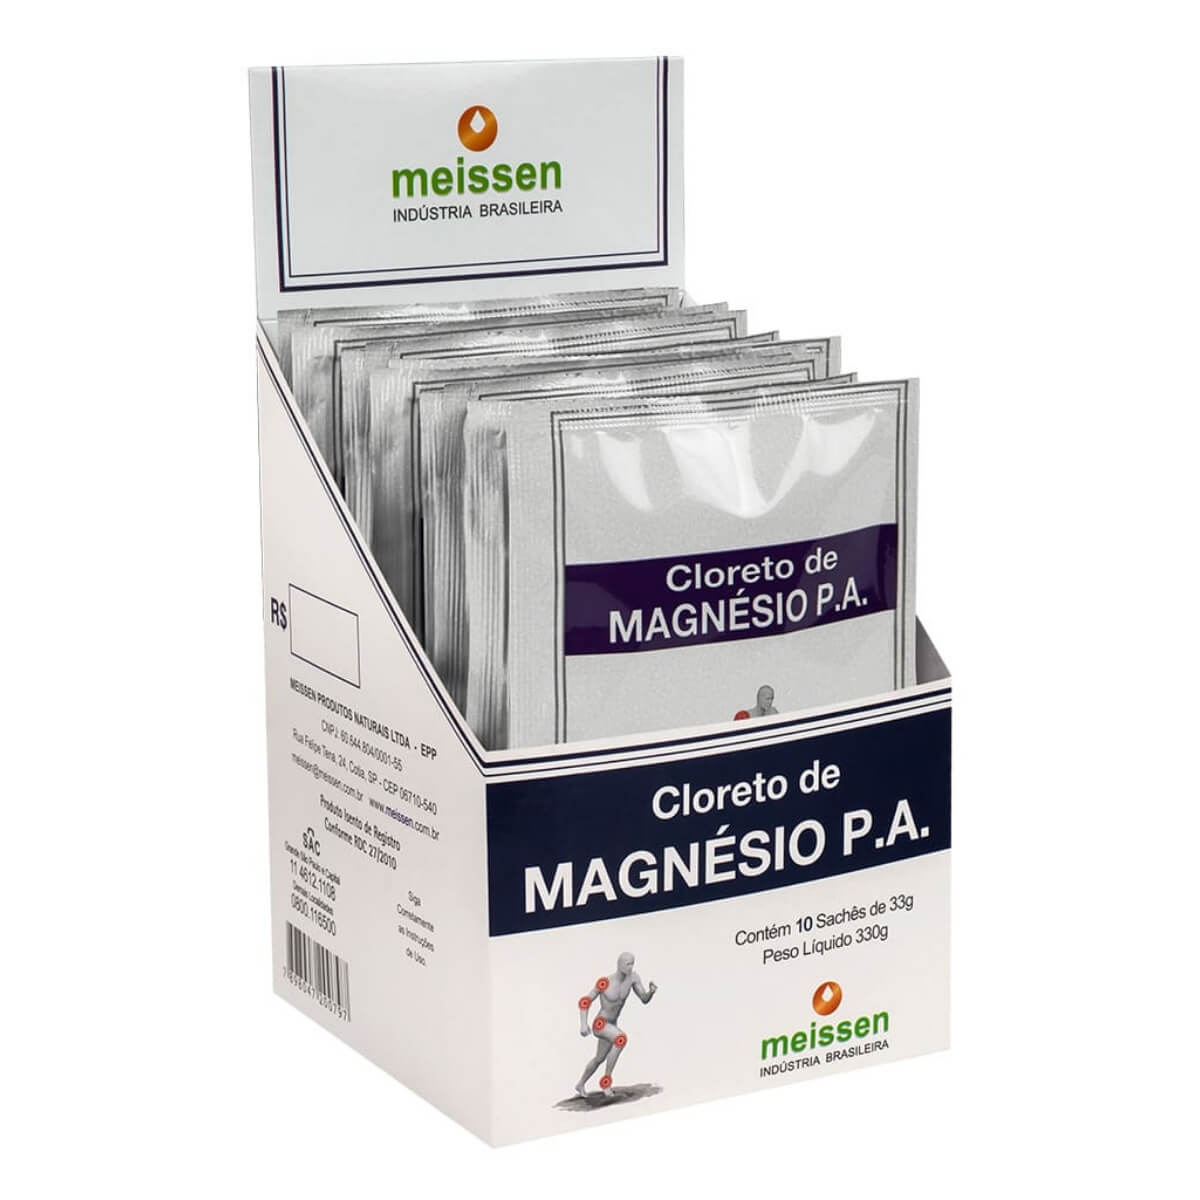 Cloreto De Magnésio Pa Caixa C/ 10 Sachê De 33g - Meissen